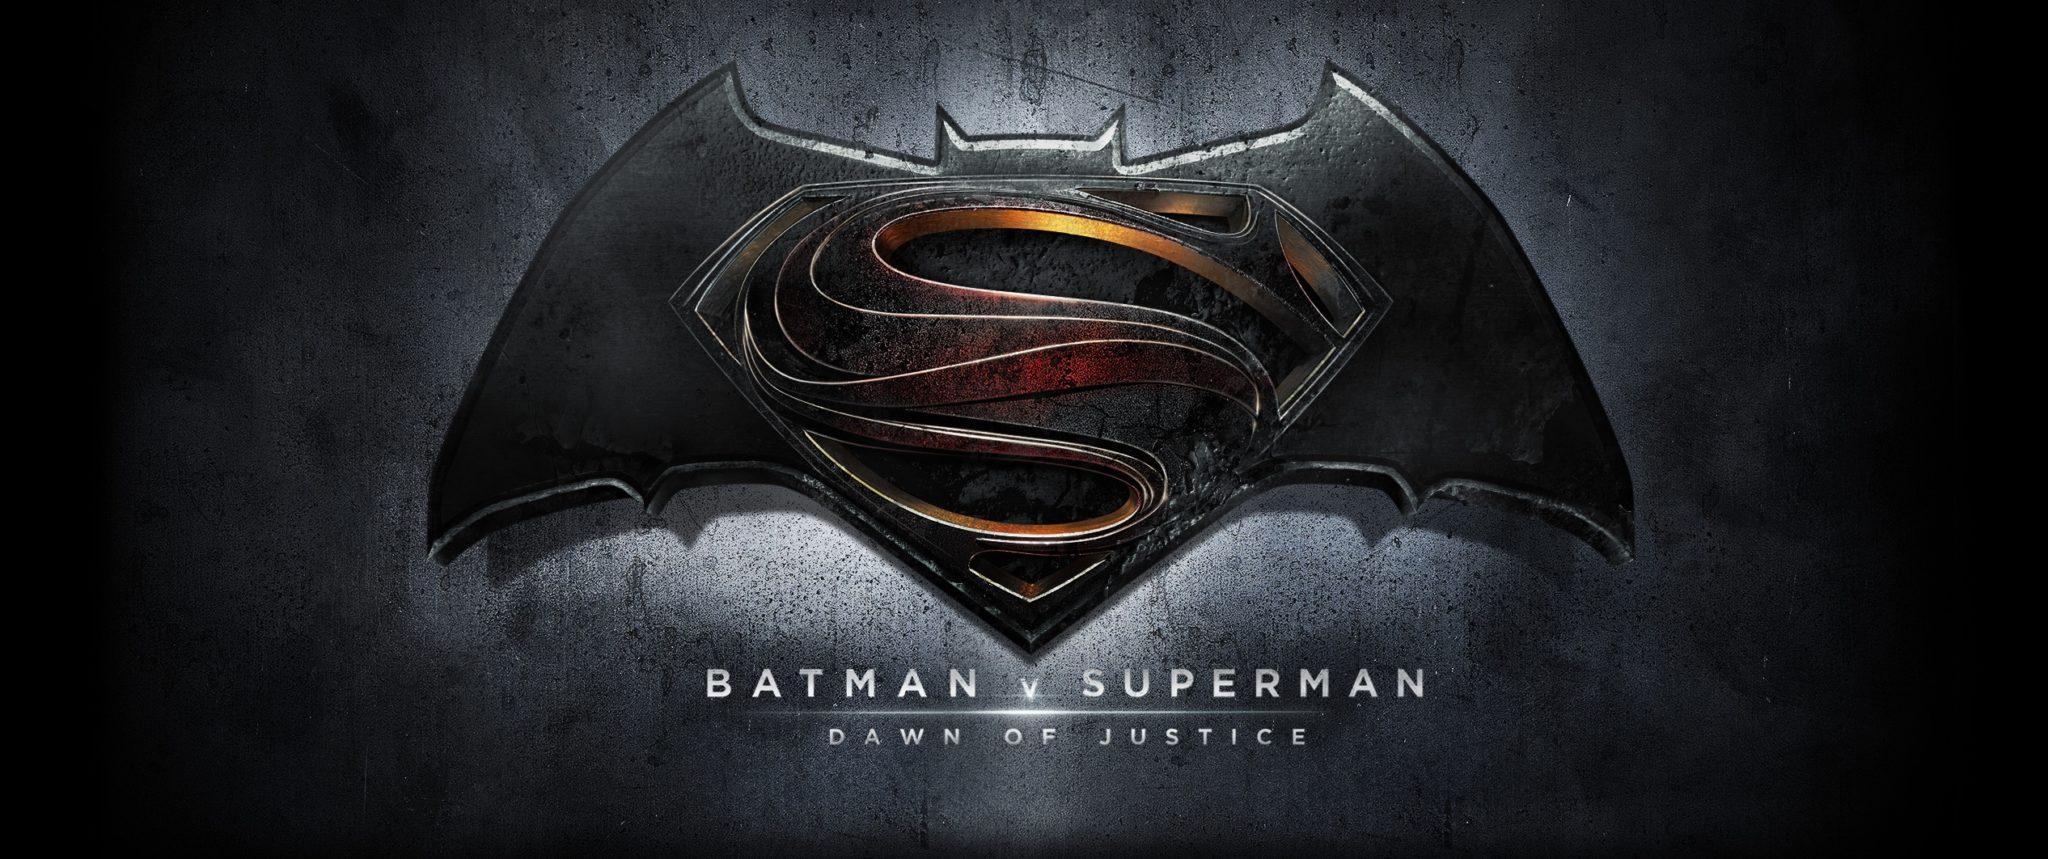 Batman v Superman: Dawn of Justice - Wikipedia